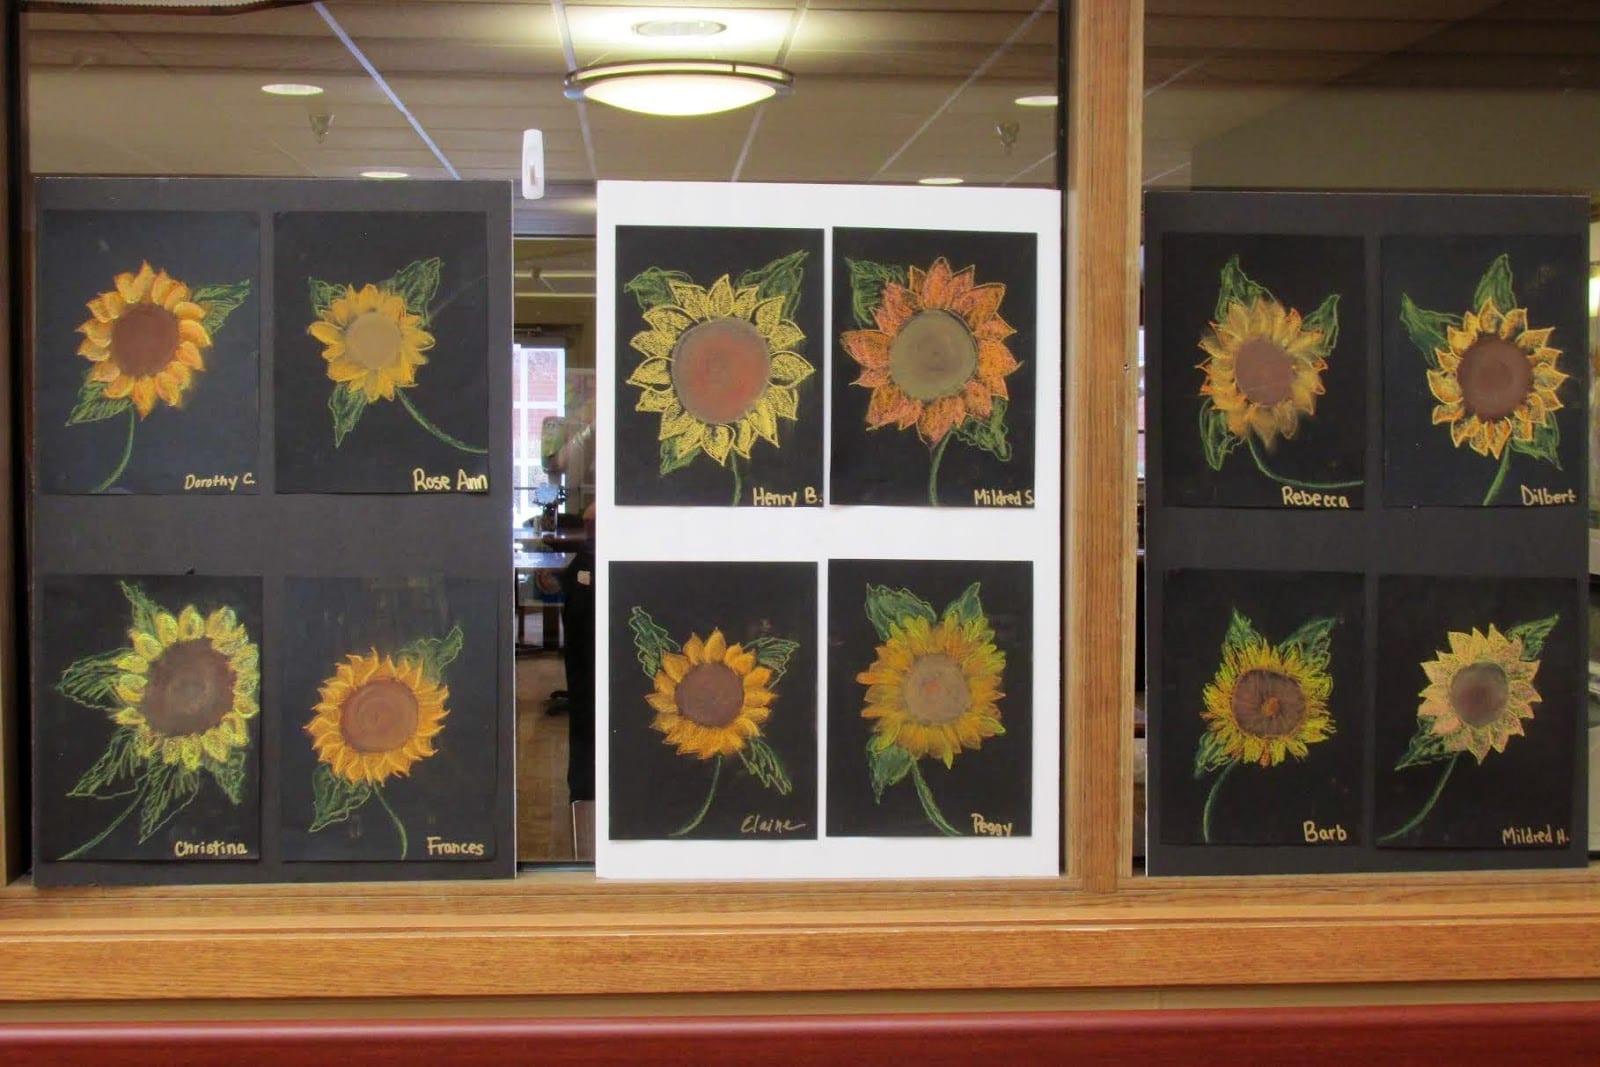 Image of sunflower artwork on display.